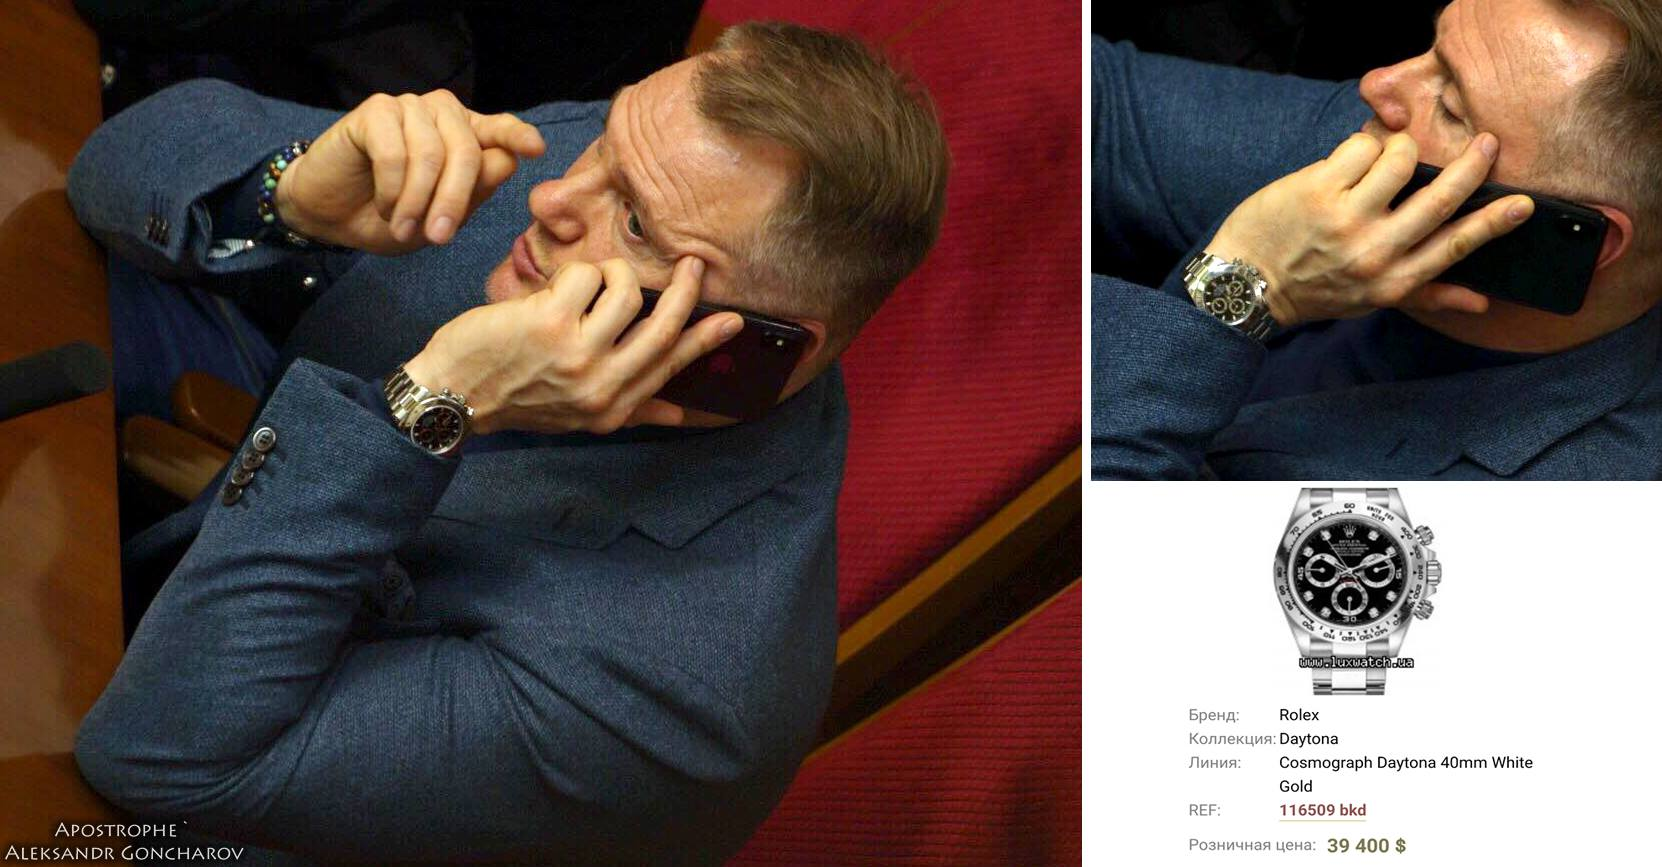 У нардепа помітили Rolex за $40 тисяч і iPhone X (ФОТО)